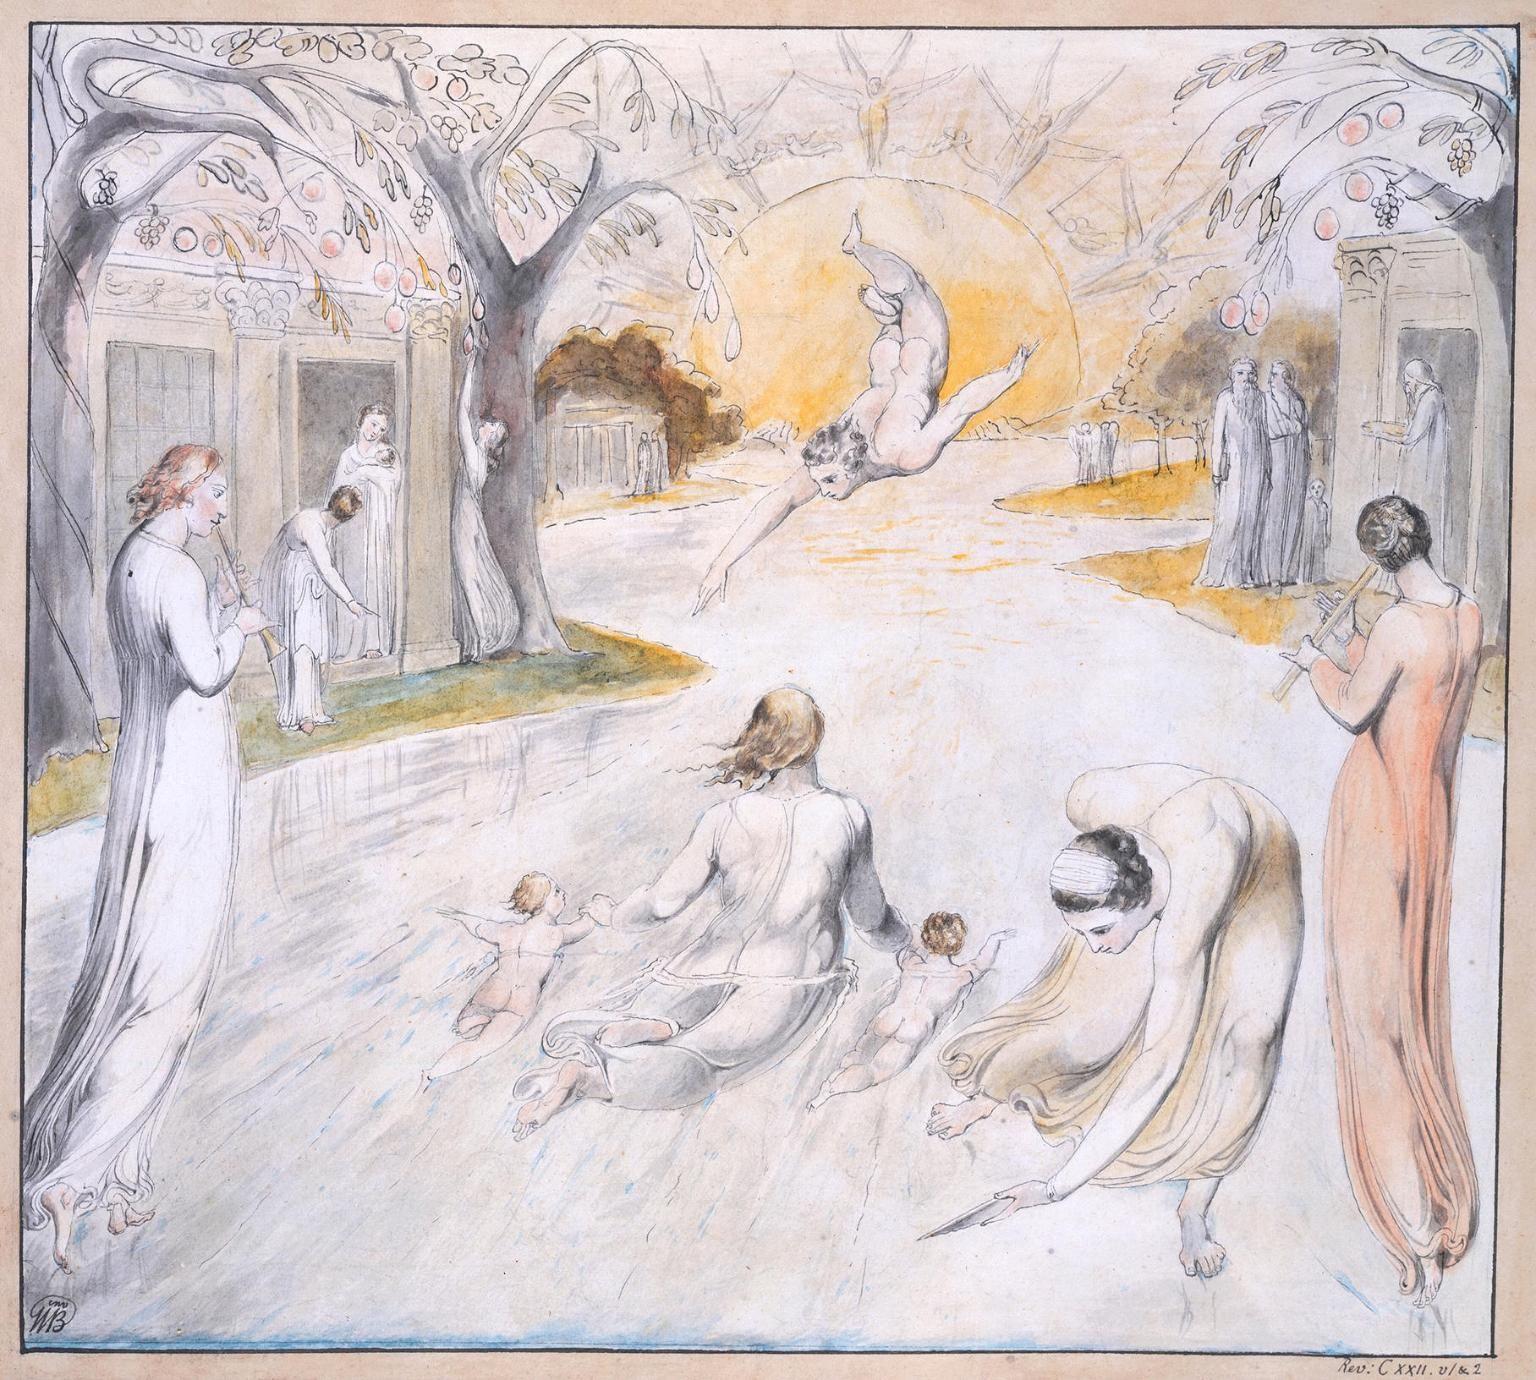 William Blake 'The River of Life', c.1805